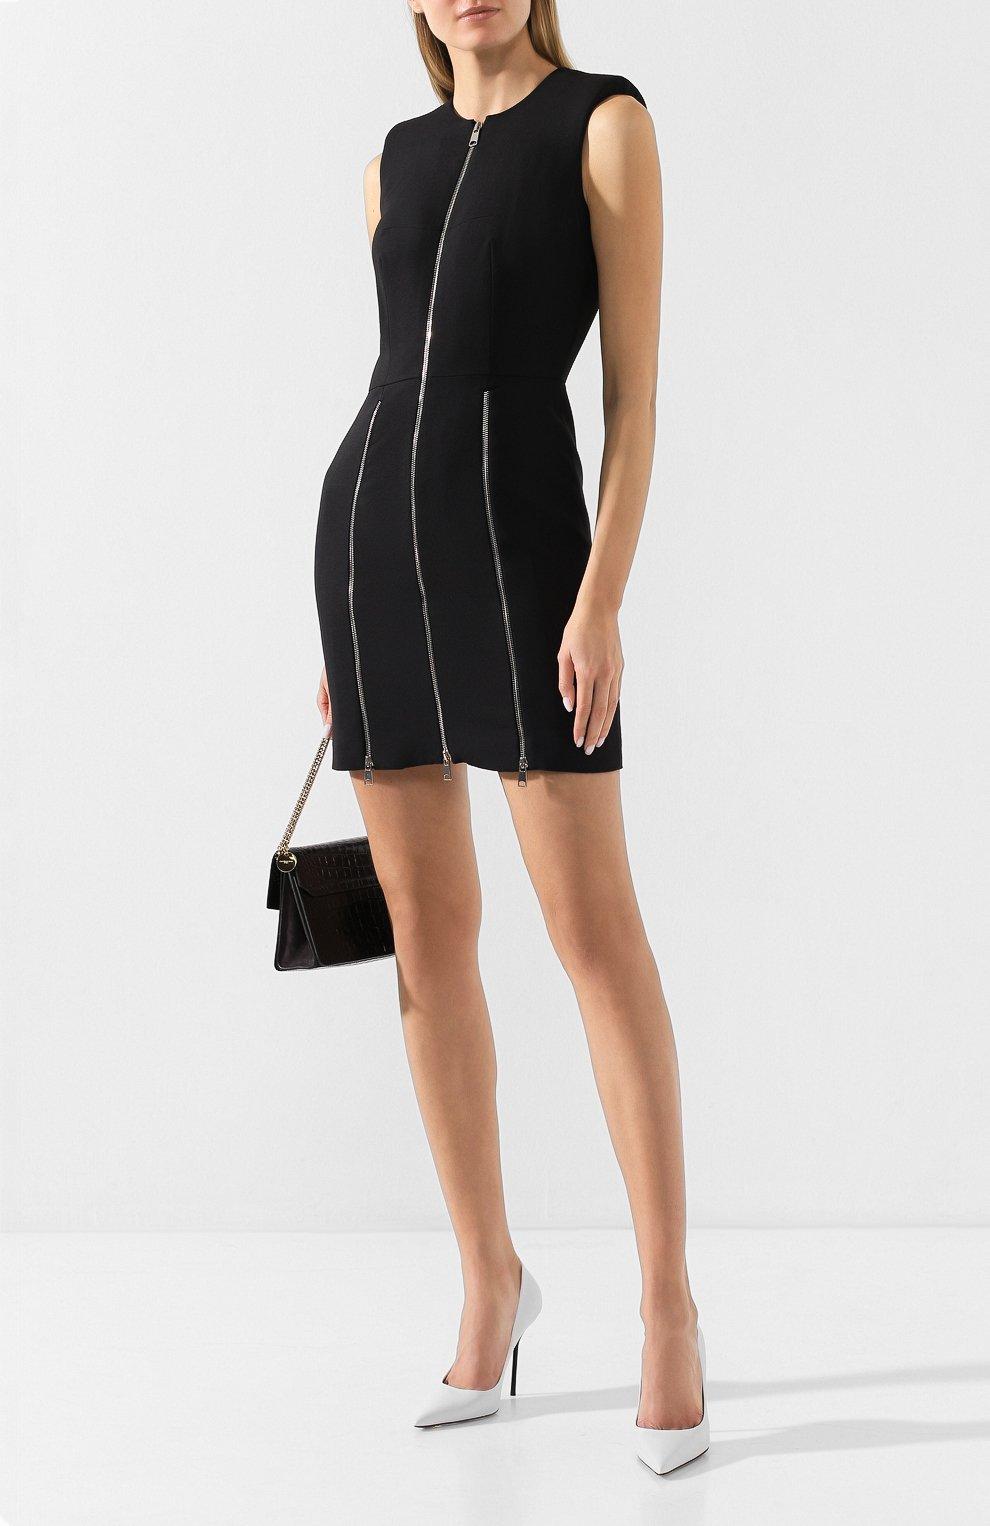 Платье из смеси шерсти и шелка | Фото №2